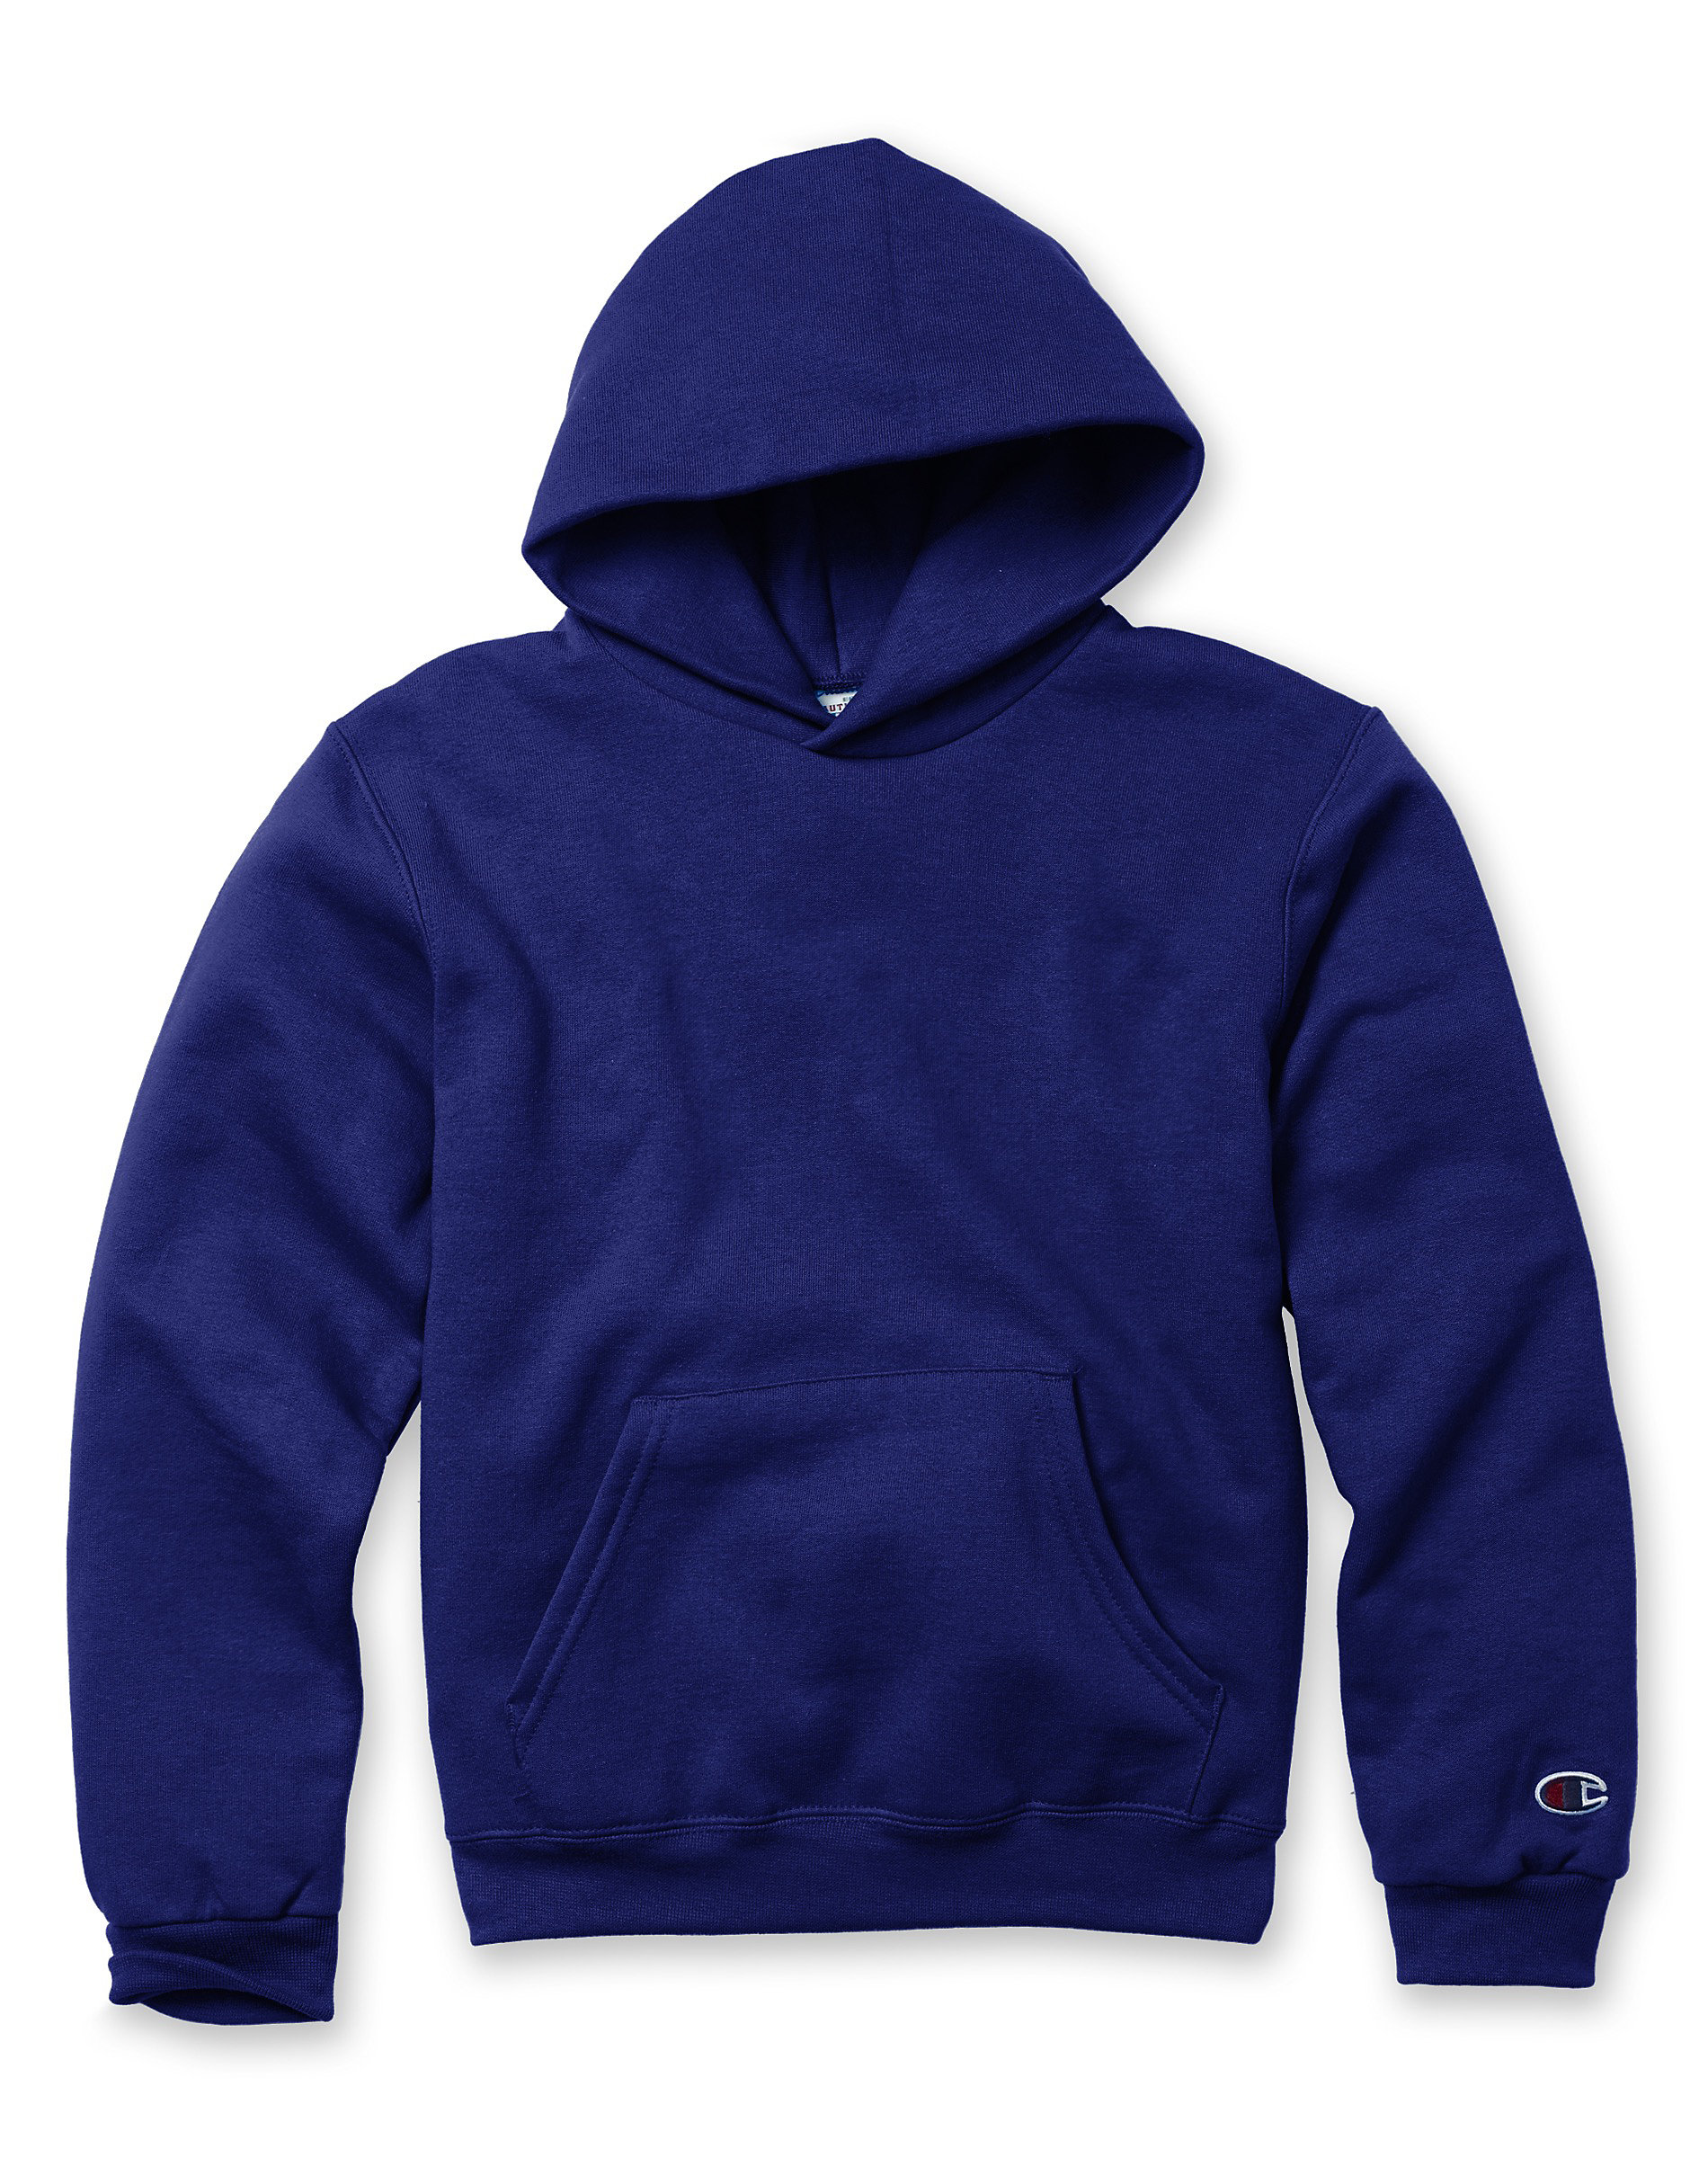 Champion Hoodie Kids Sweatshirt Double Dry Action Fleece Pullover Girls Boys